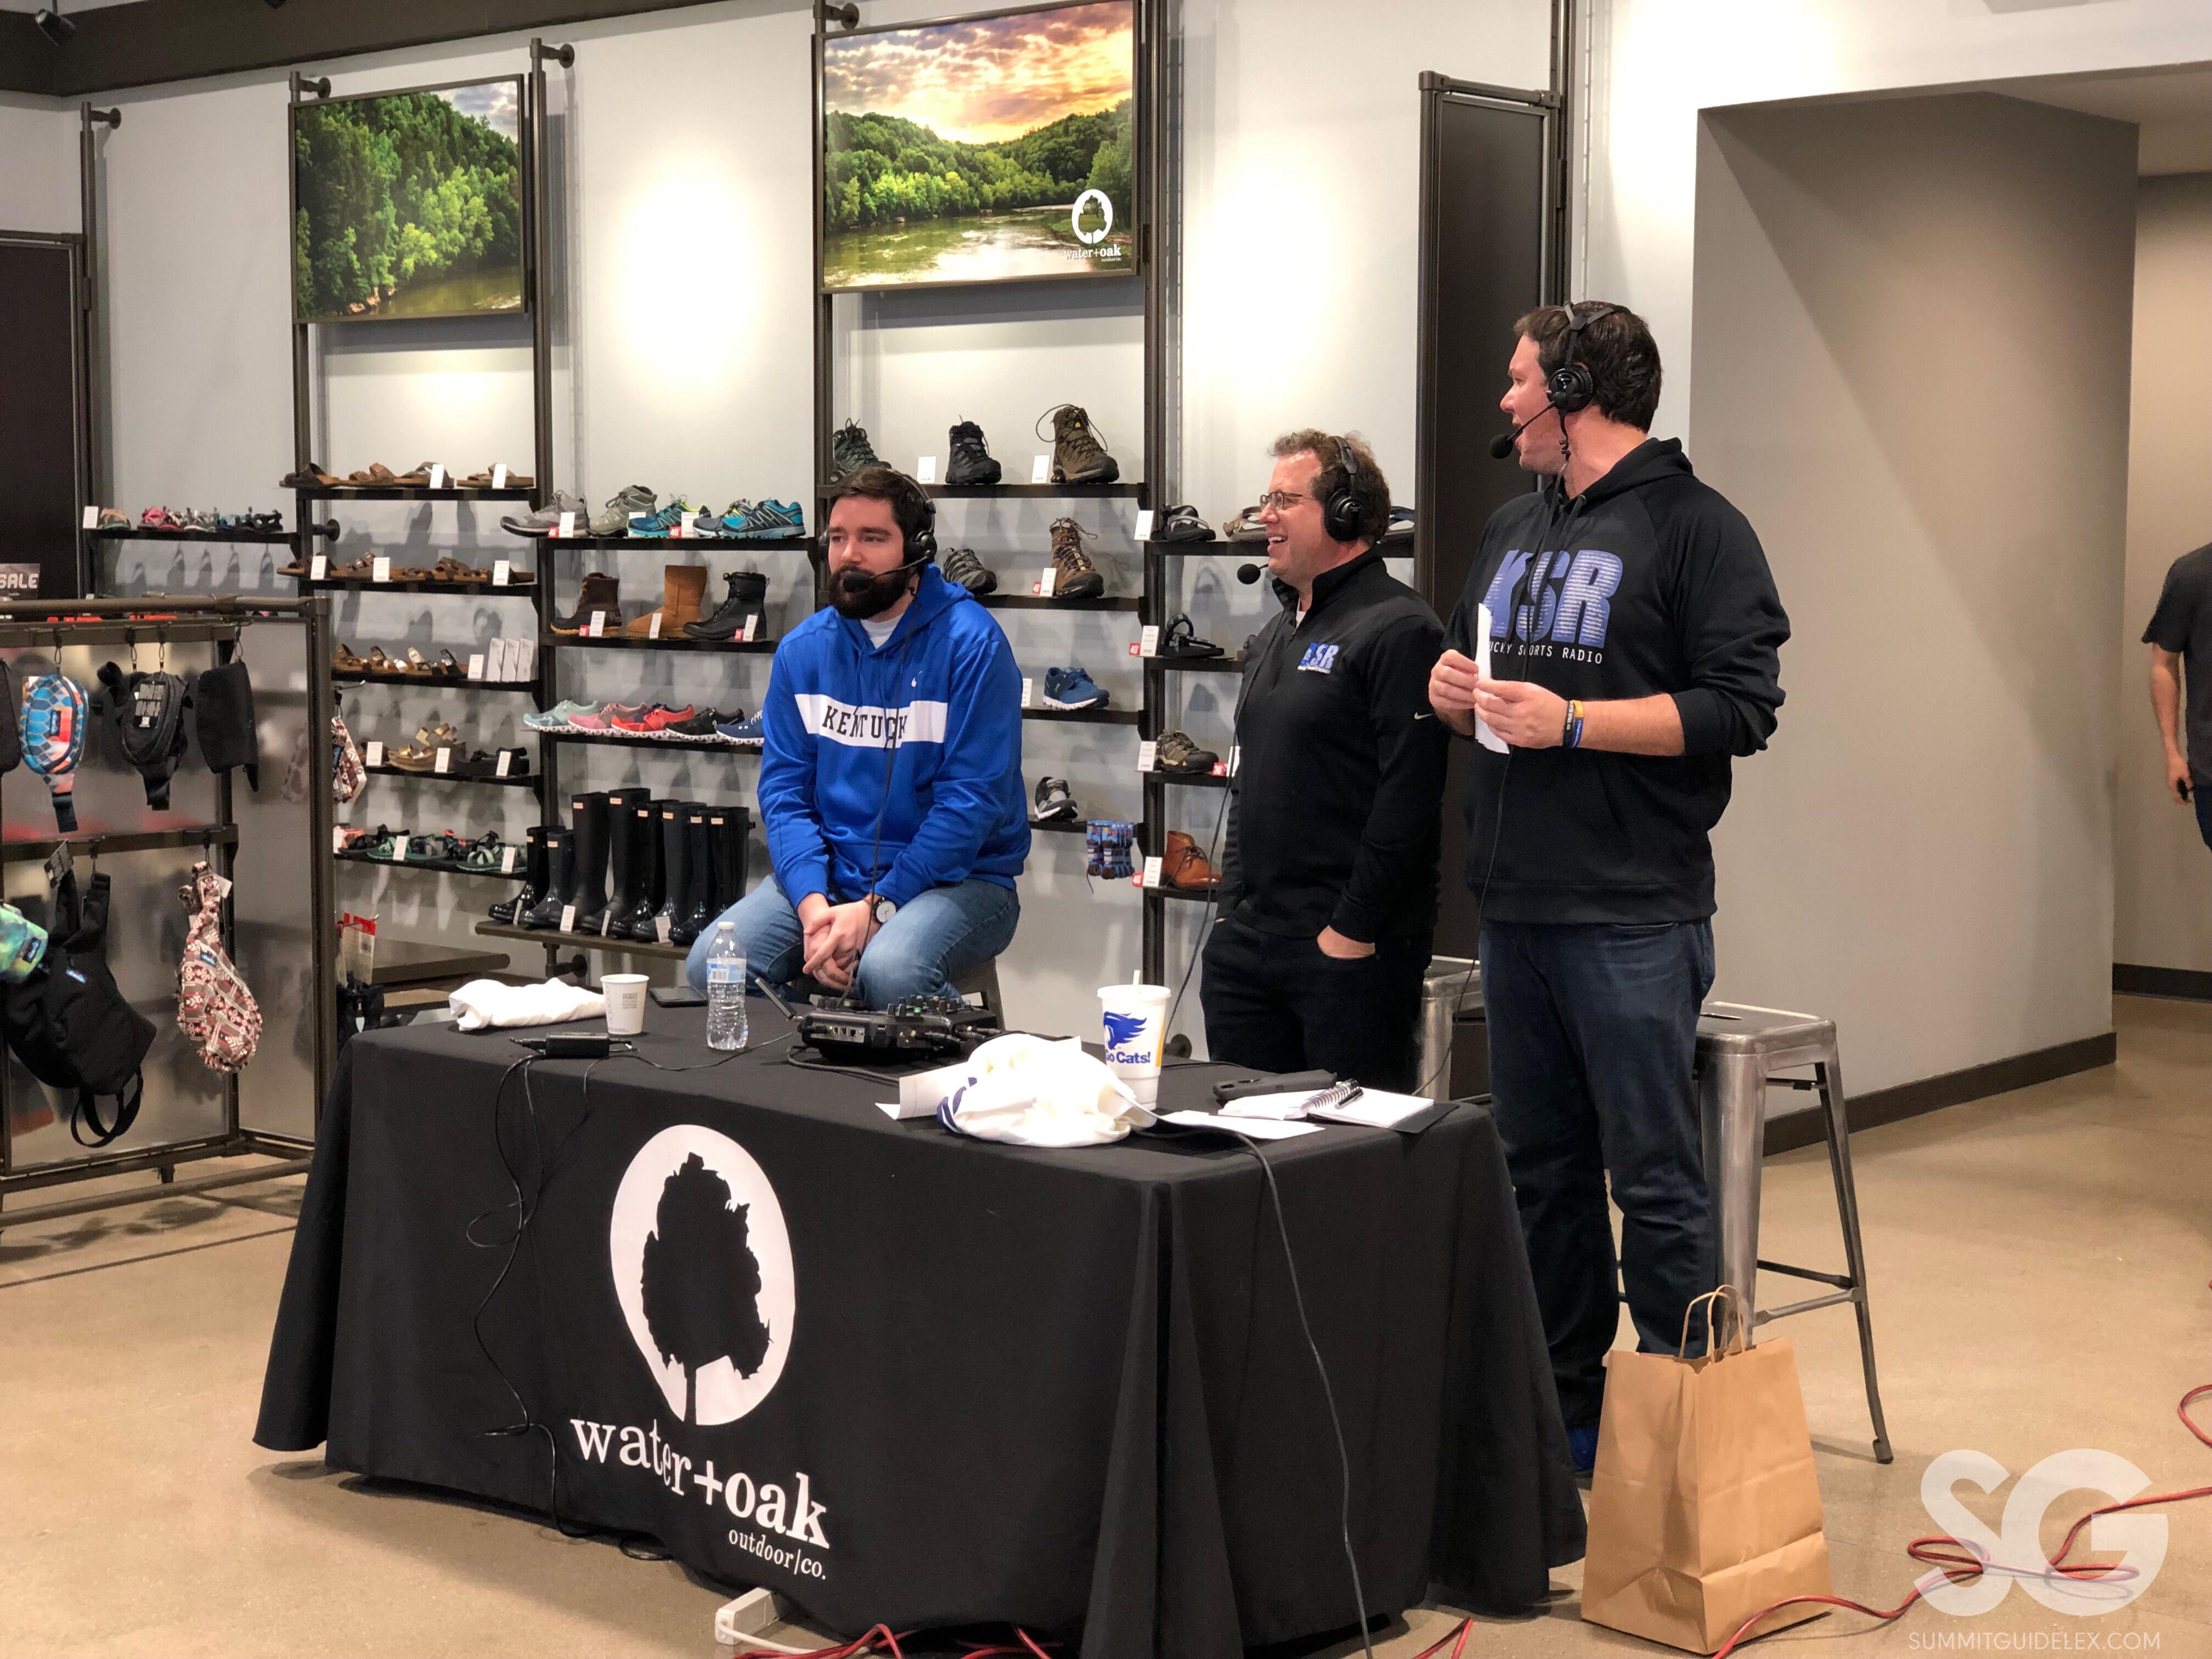 Sports Radio: three guys with headphones on broadcasting a radio show with blue and black sweatshirts